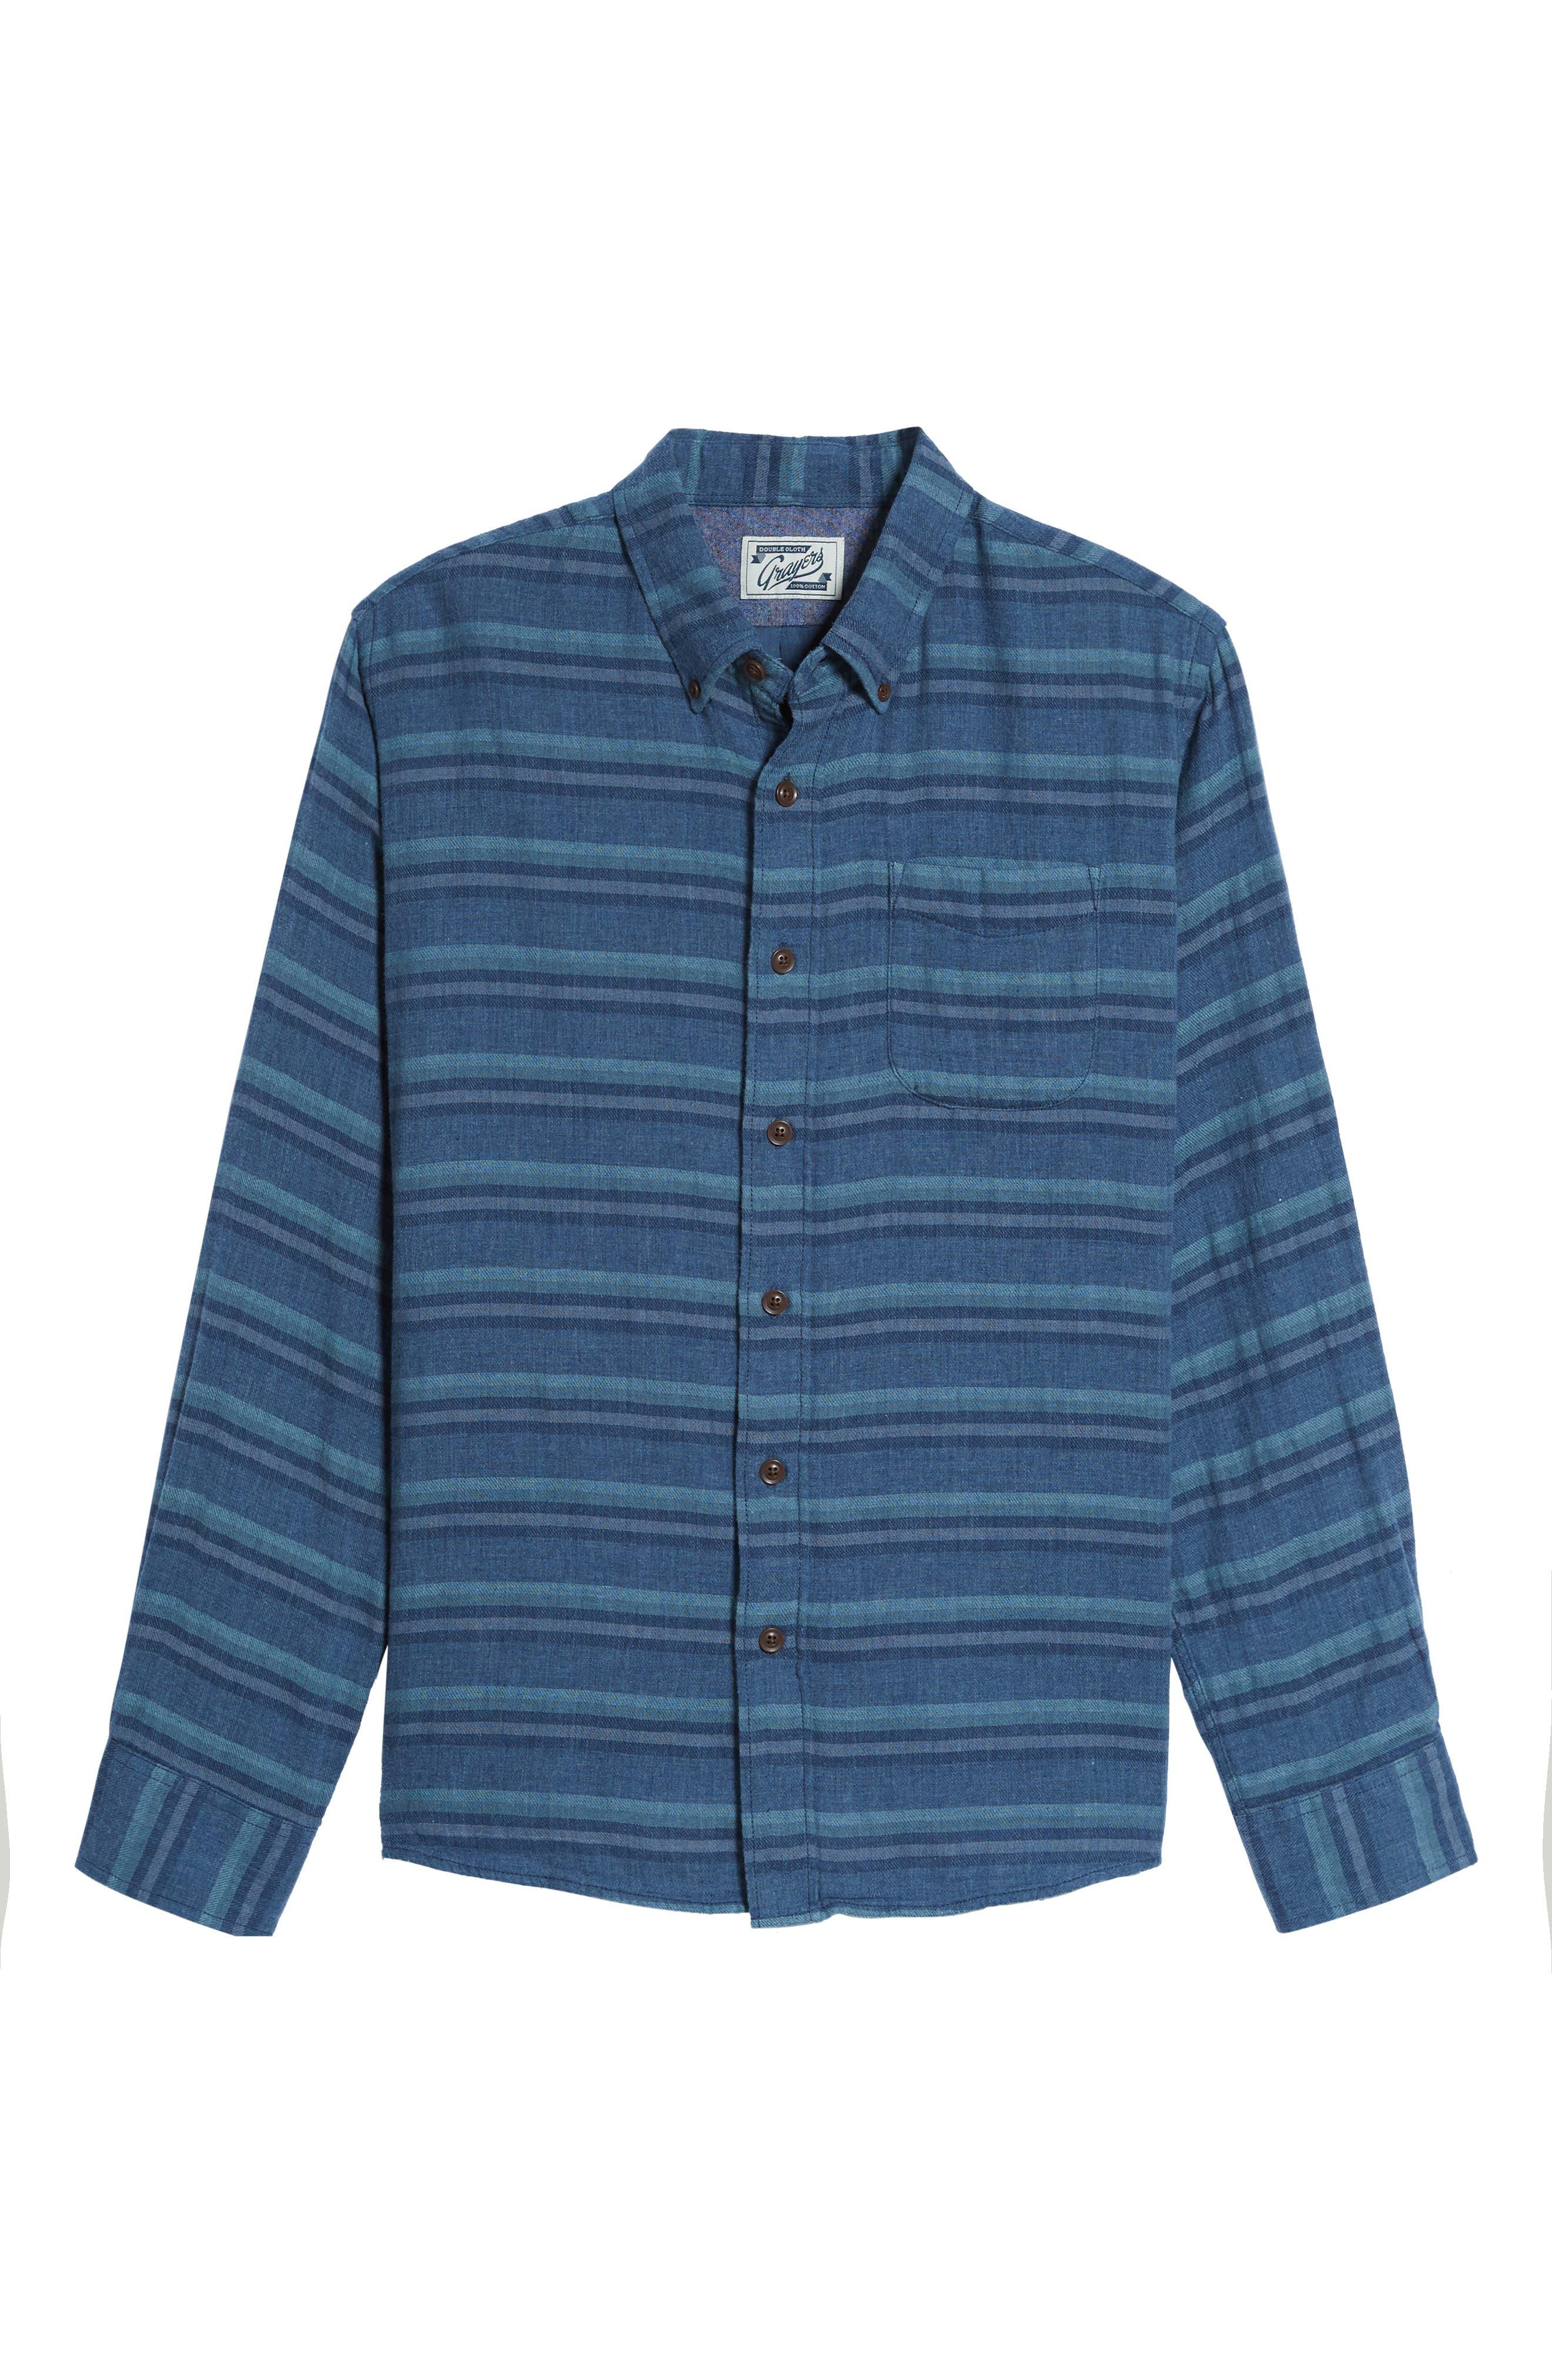 Harcourt Modern Fit Double Cloth Striped Sport Shirt,                             Alternate thumbnail 6, color,                             462